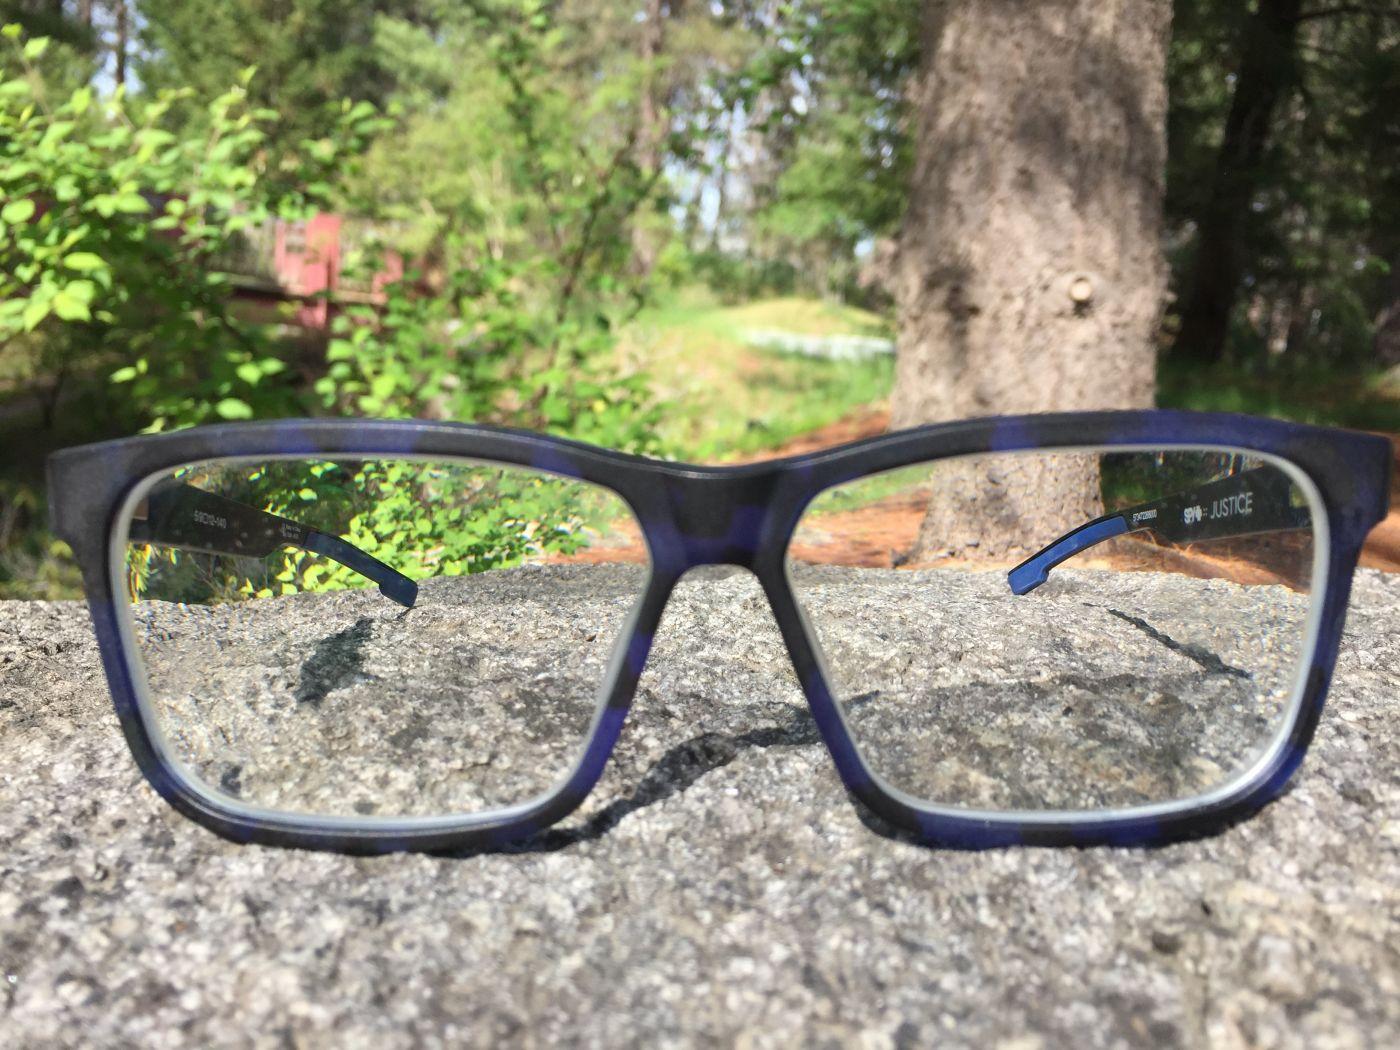 6bbbccce8c Spy Optics Justice Rx Glasses Review - FeedTheHabit.com